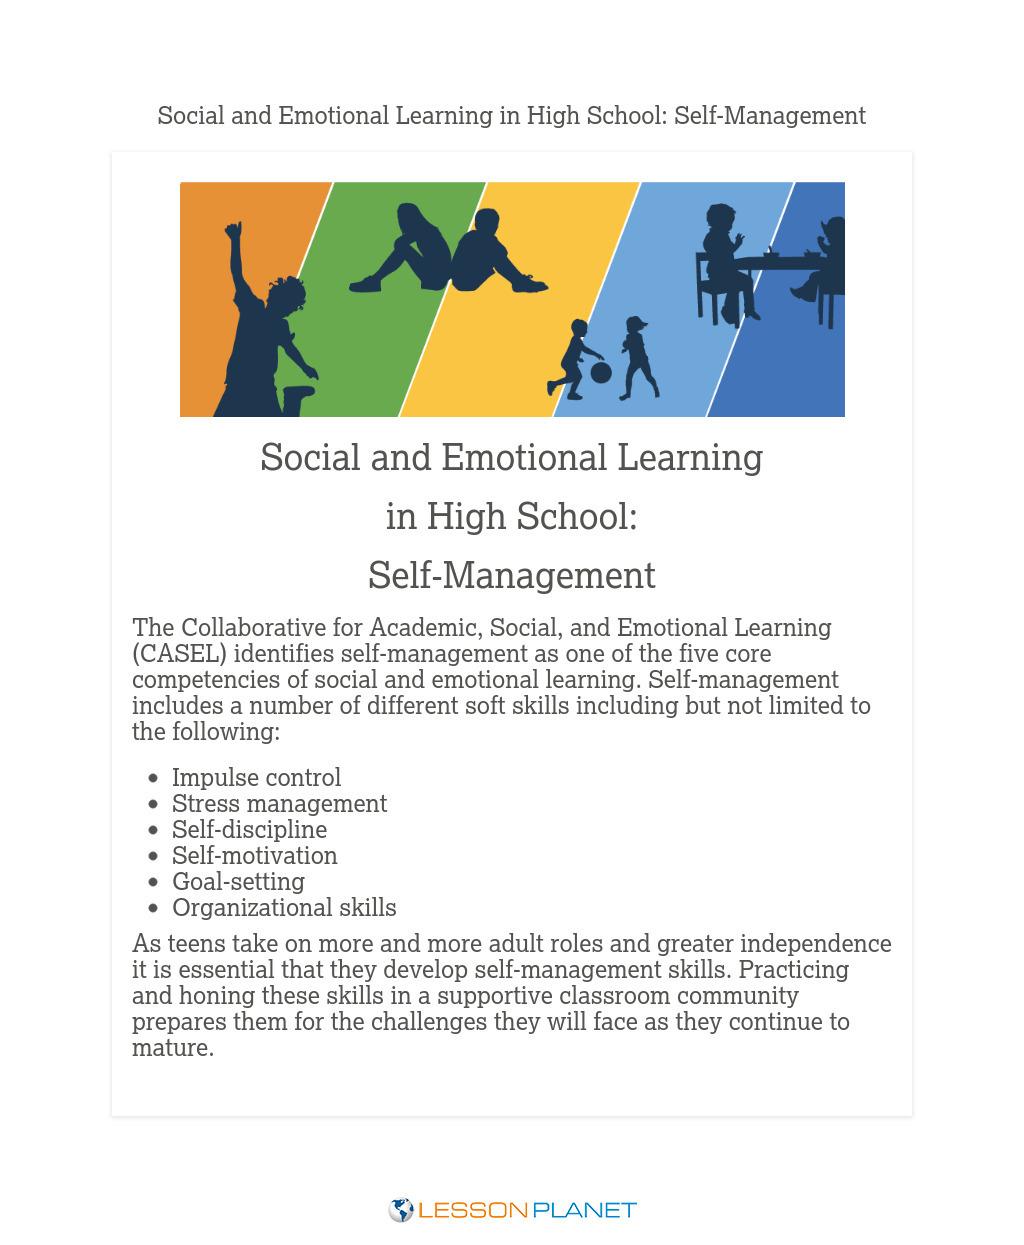 Developmental \u0026 Behavioral Disorders Lesson Plans \u0026 Worksheets   Lesson  Planet [ 1245 x 1024 Pixel ]